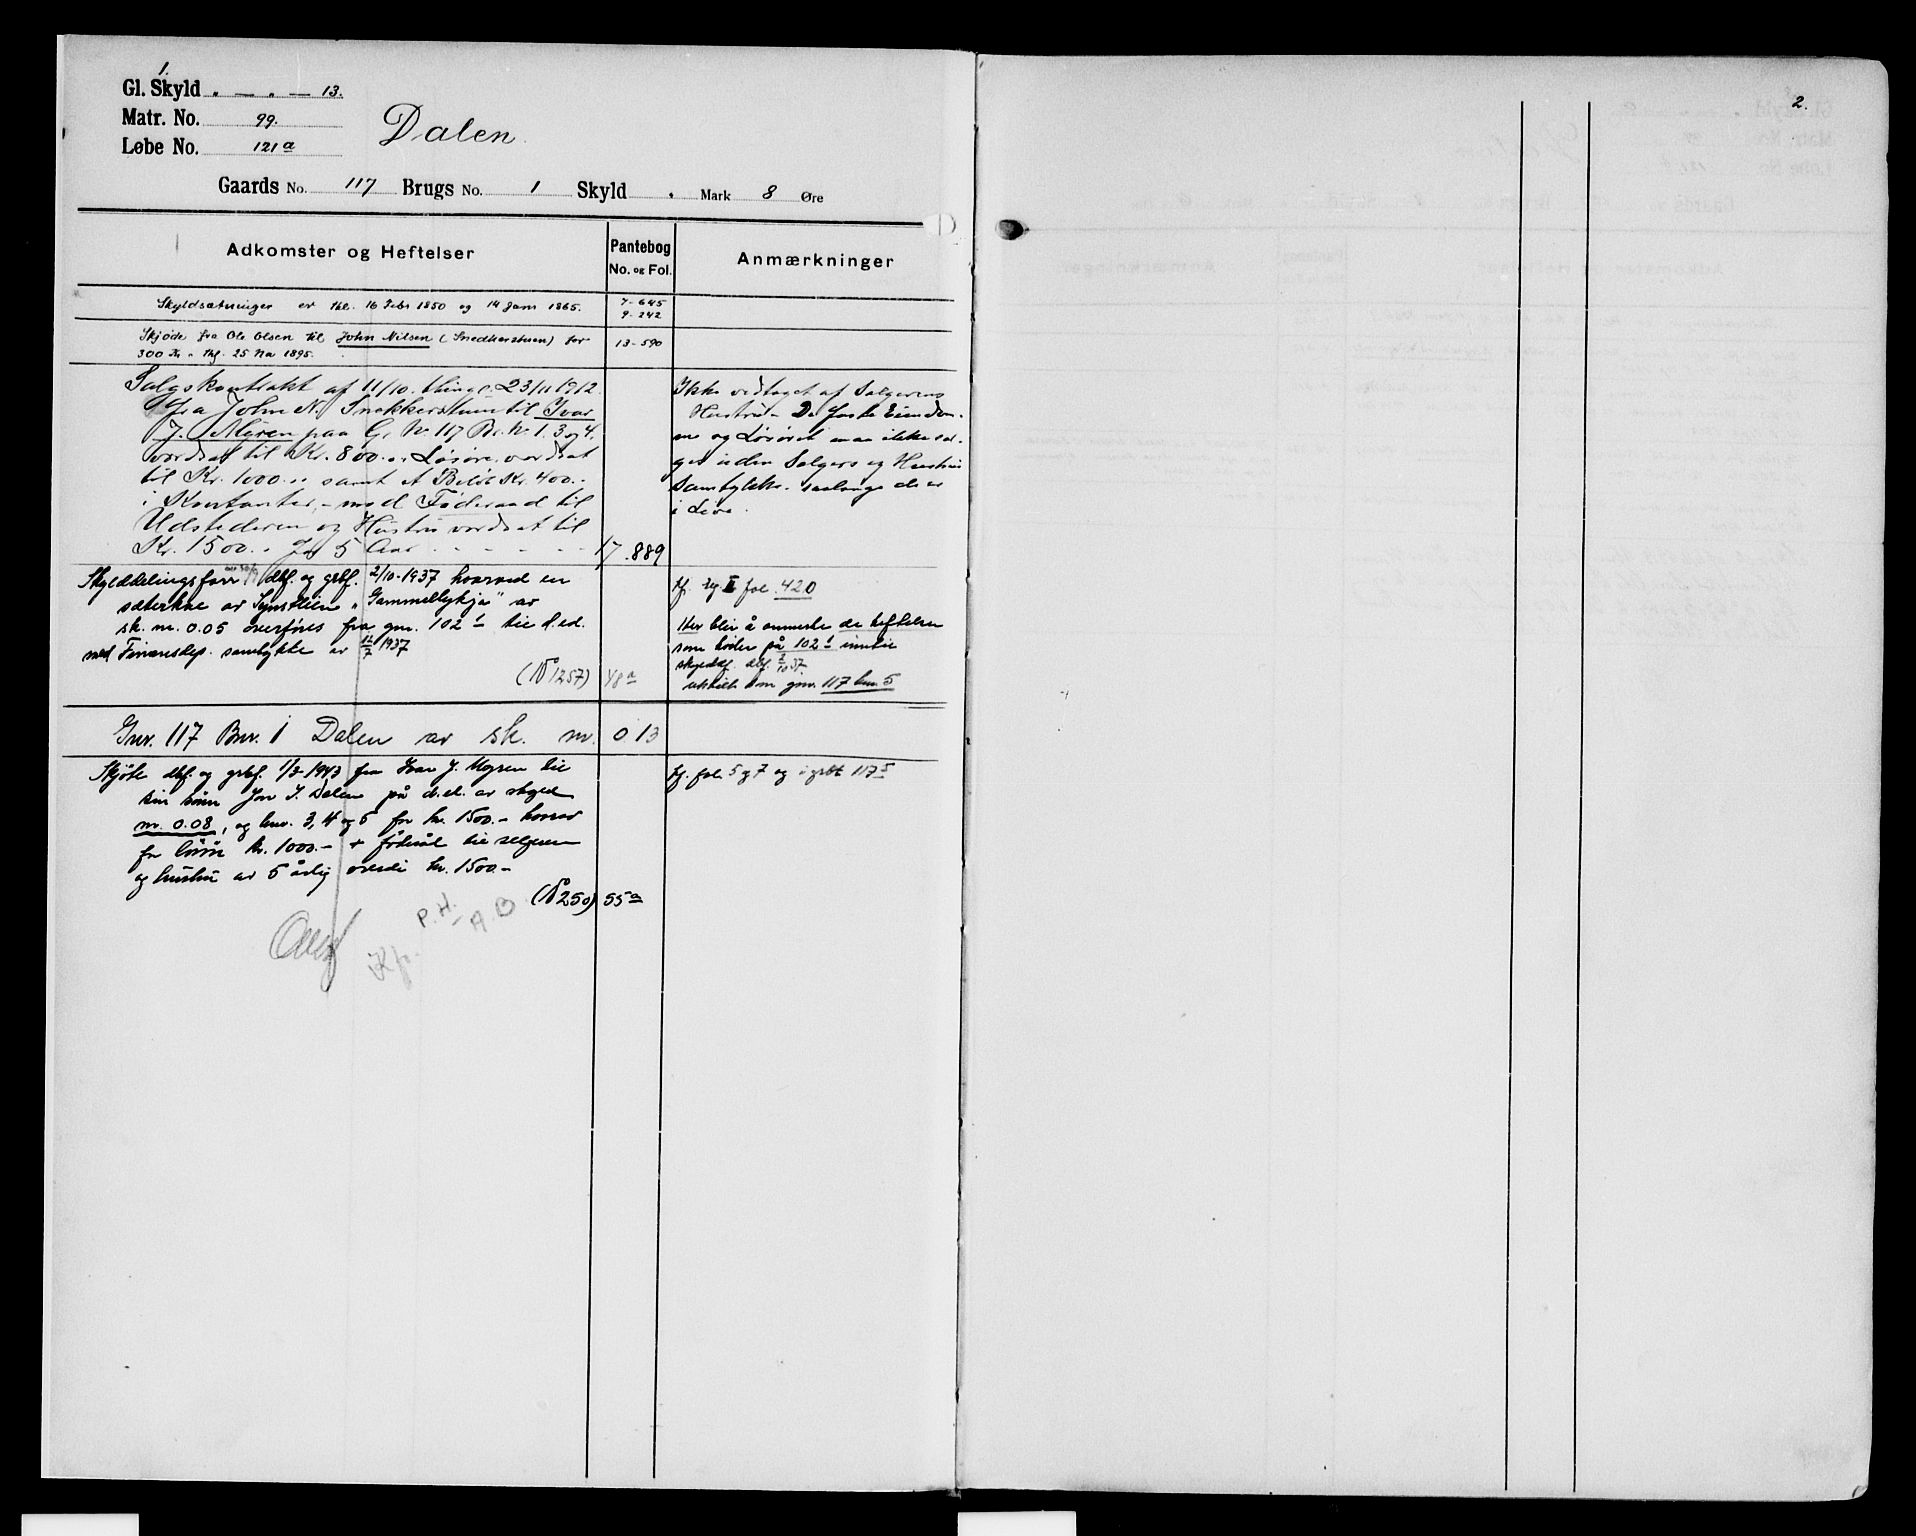 SAH, Nord-Gudbrandsdal tingrett, H/Ha/Had/L0008: Panteregister nr. 8, 1908-1950, s. 1-2